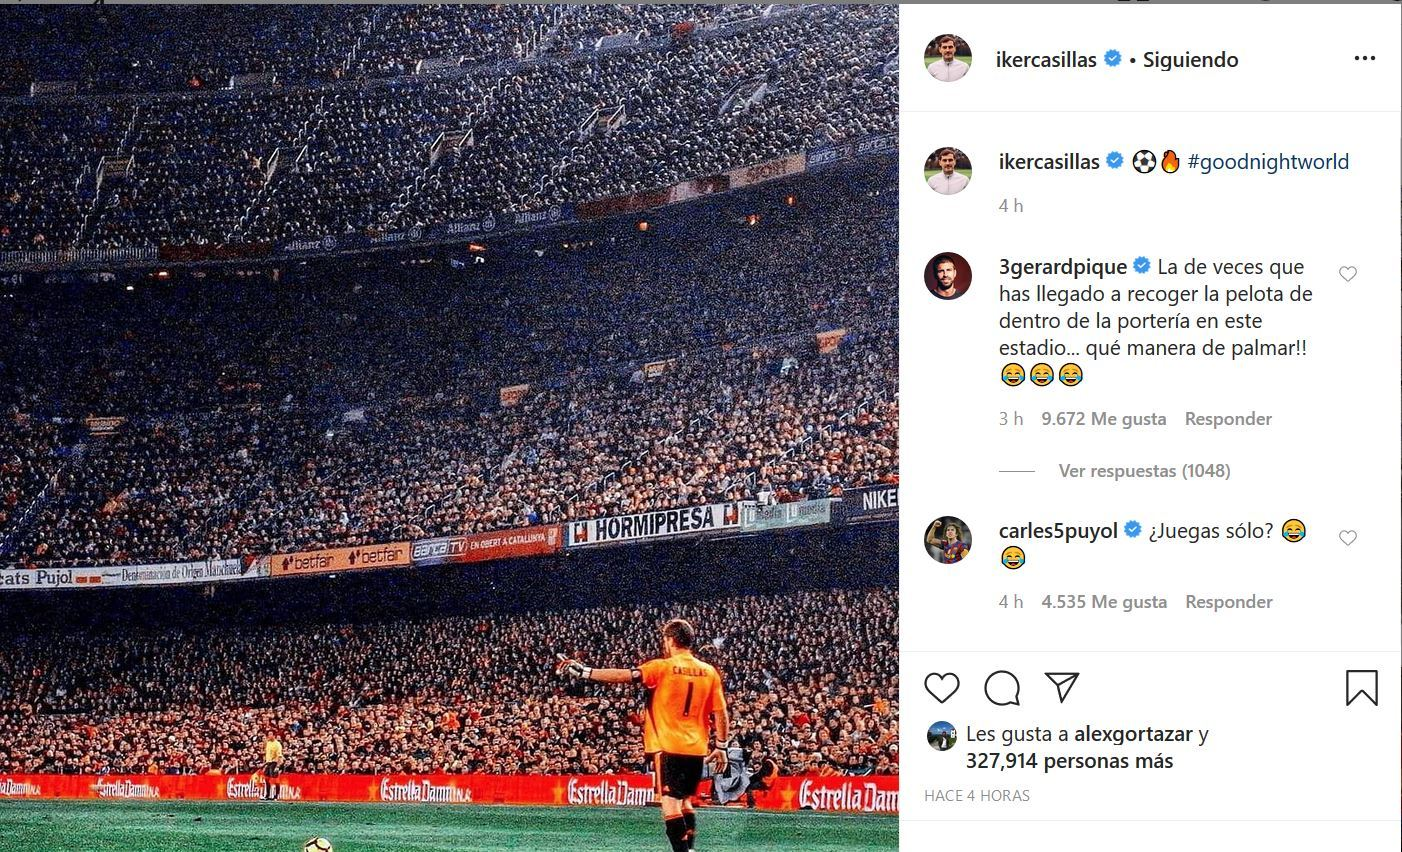 Puyol and Pique joke about Casillas' Instagram post - Bóng Đá